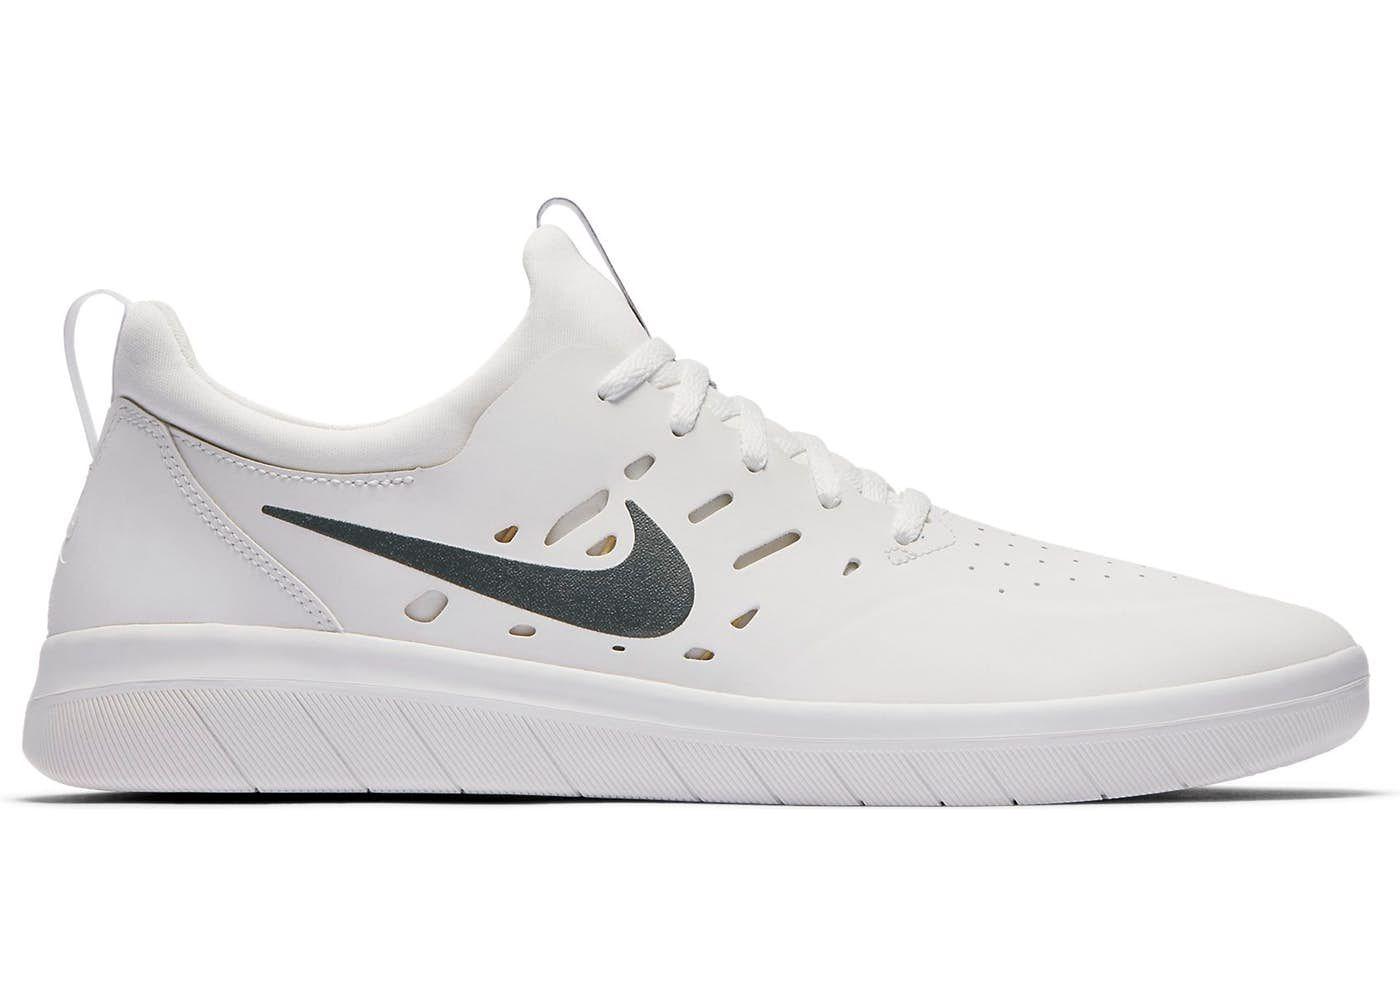 Nike SB Nyjah White Anthracite  715096225